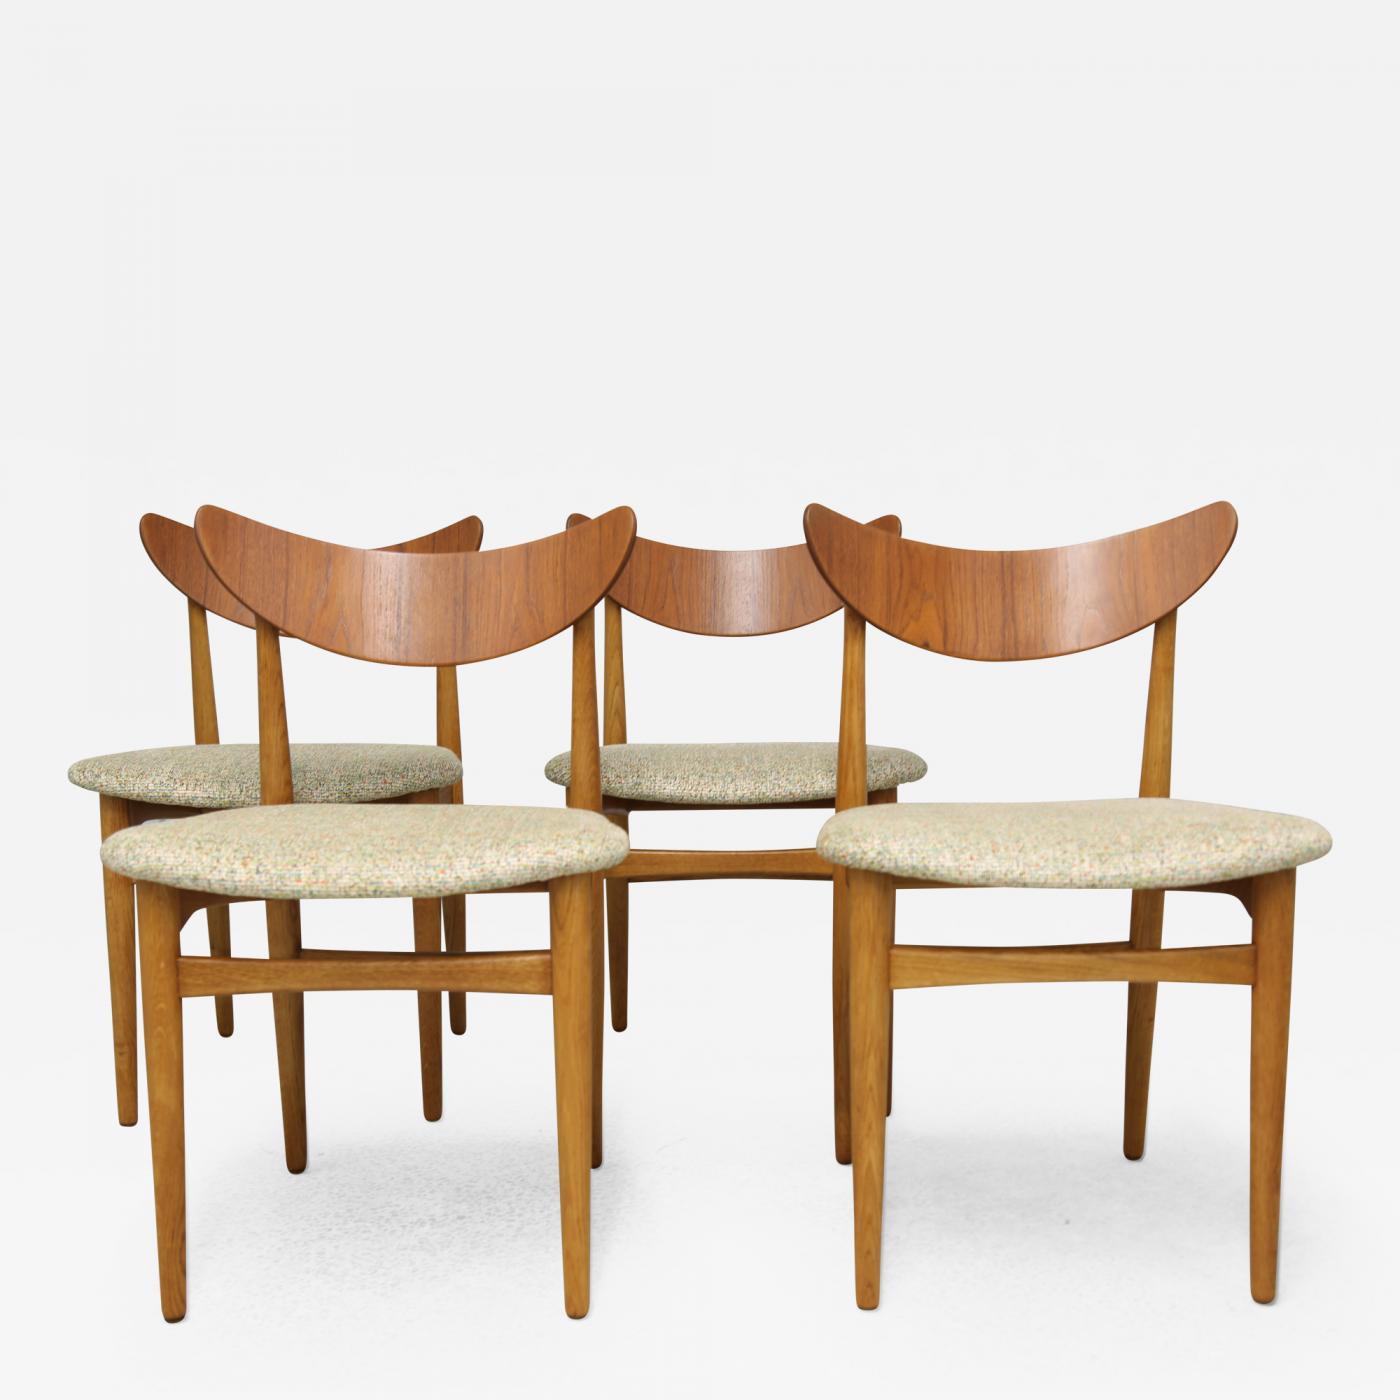 Stupendous Danish Mid Century Modern Dining Chairs Set Of 4 Short Links Chair Design For Home Short Linksinfo